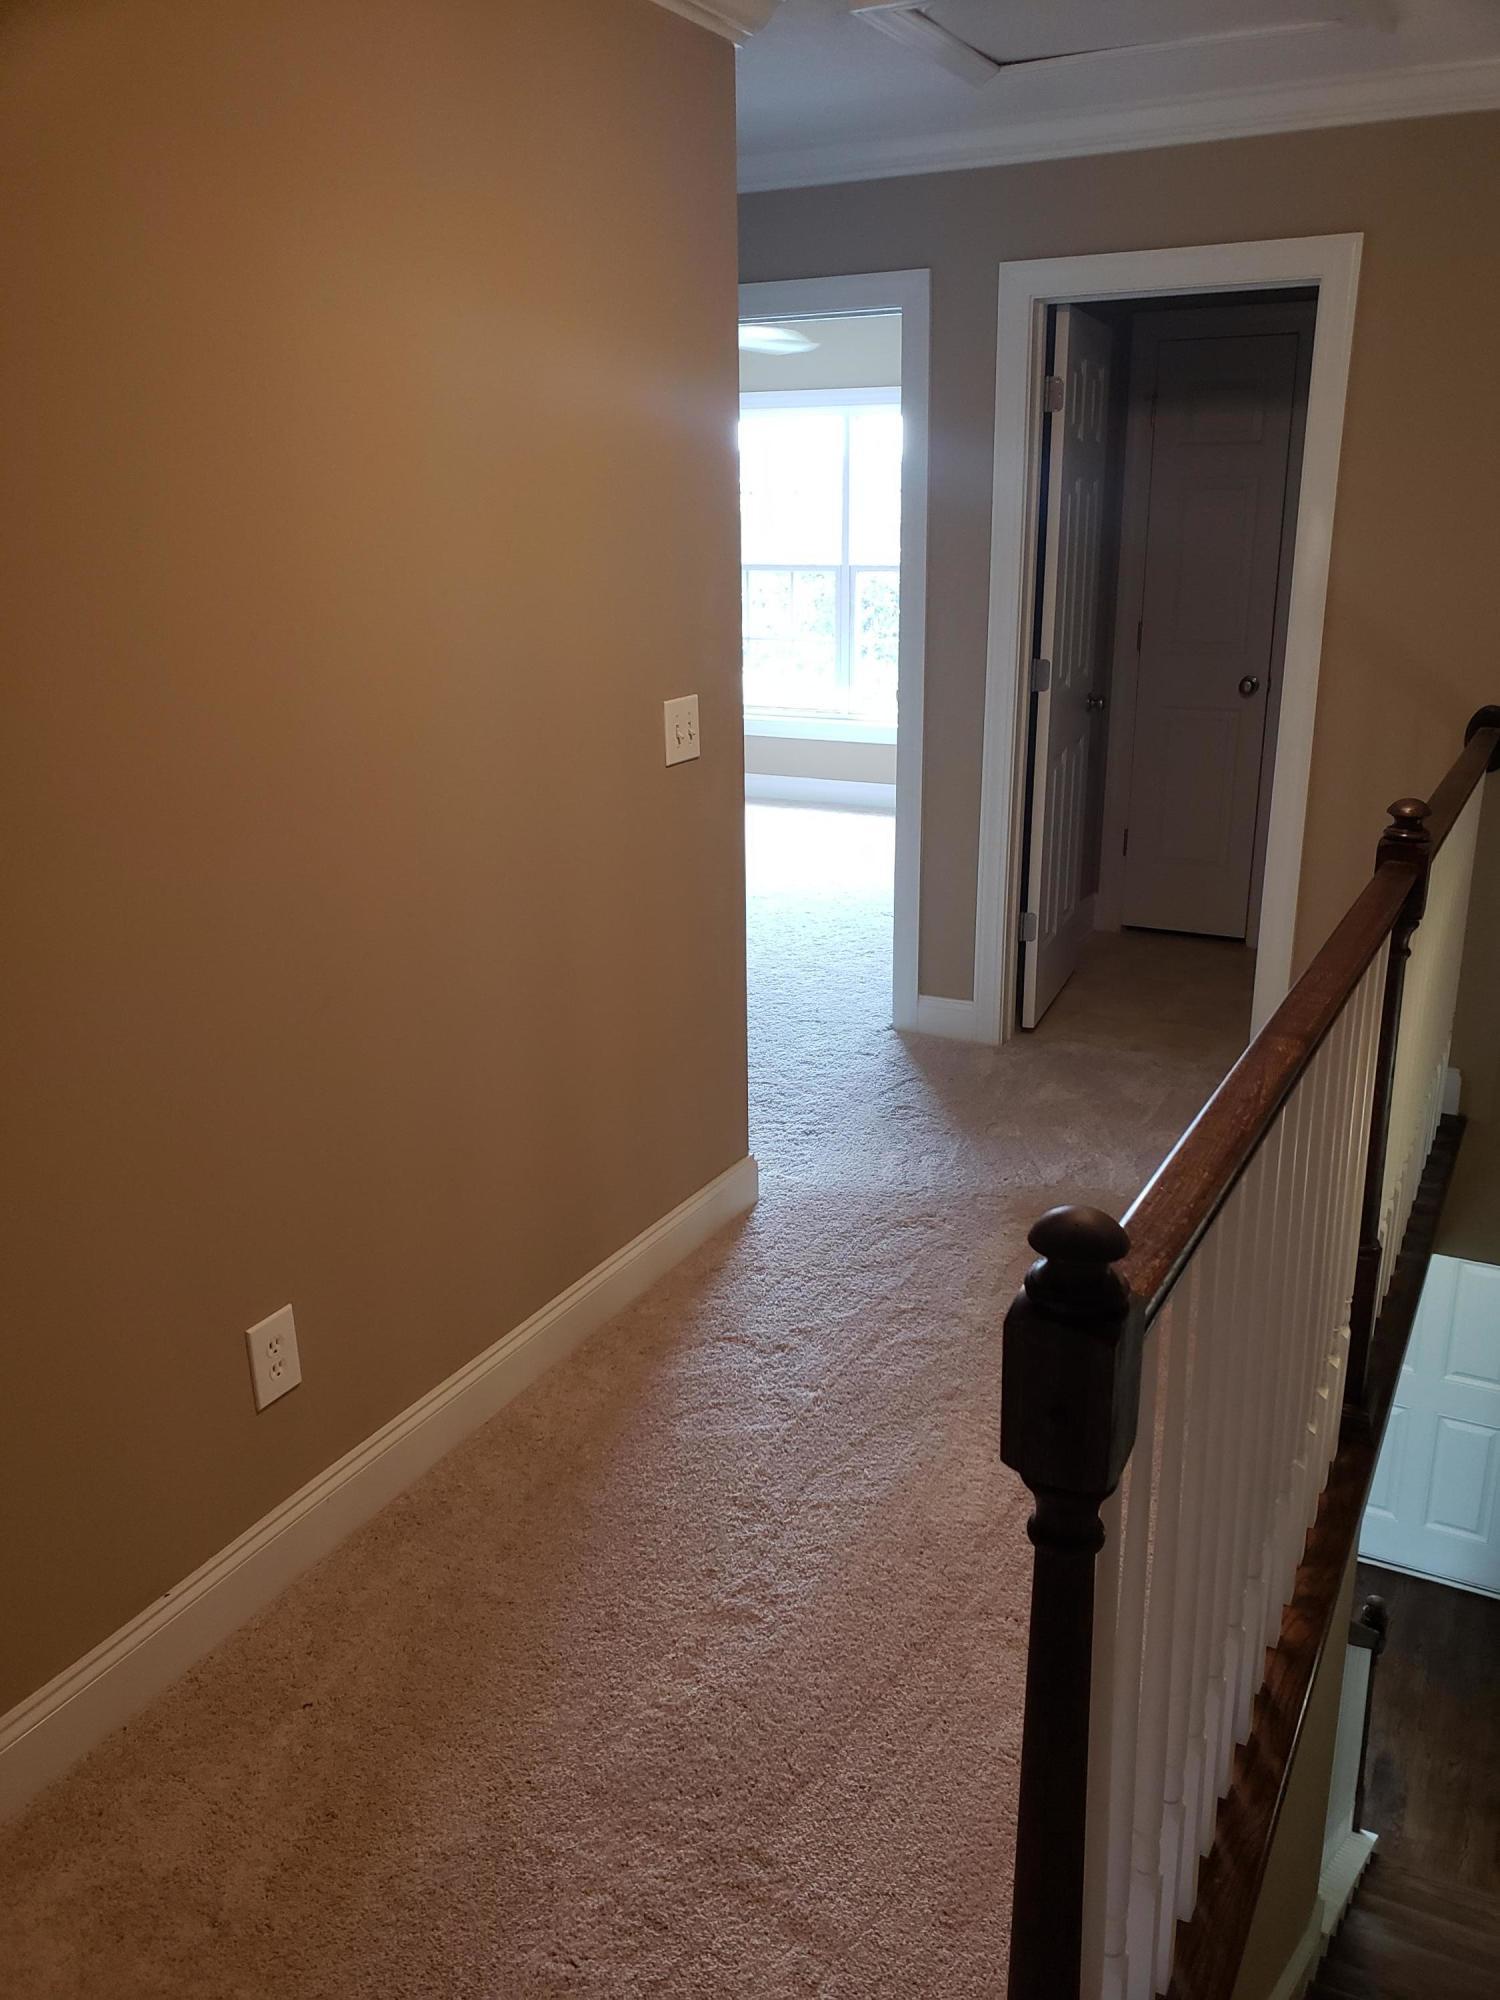 Montague Pointe Homes For Sale - 100 Gavins, Goose Creek, SC - 4